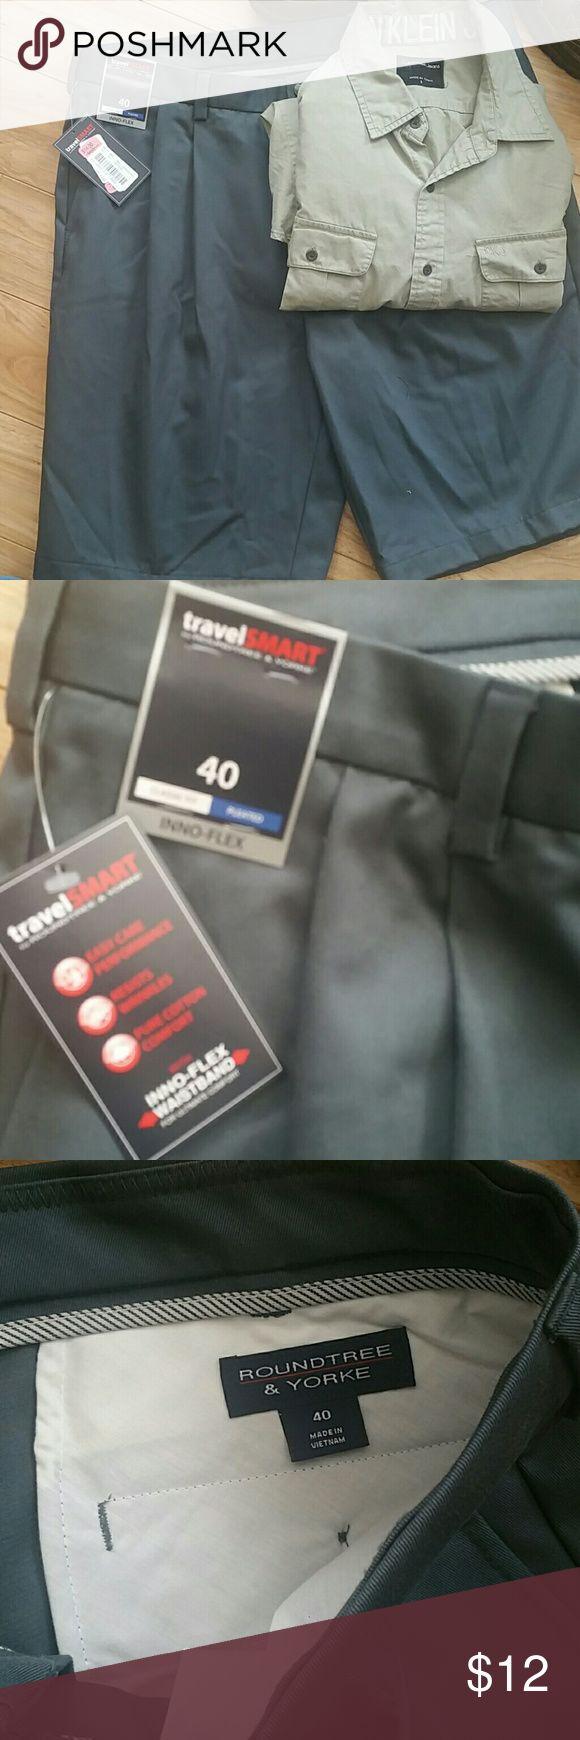 Men's Travel Smart Shorts size 40 Roundtree & York Travel Smart pleated front shorts. Roundtree & Yorke Shorts